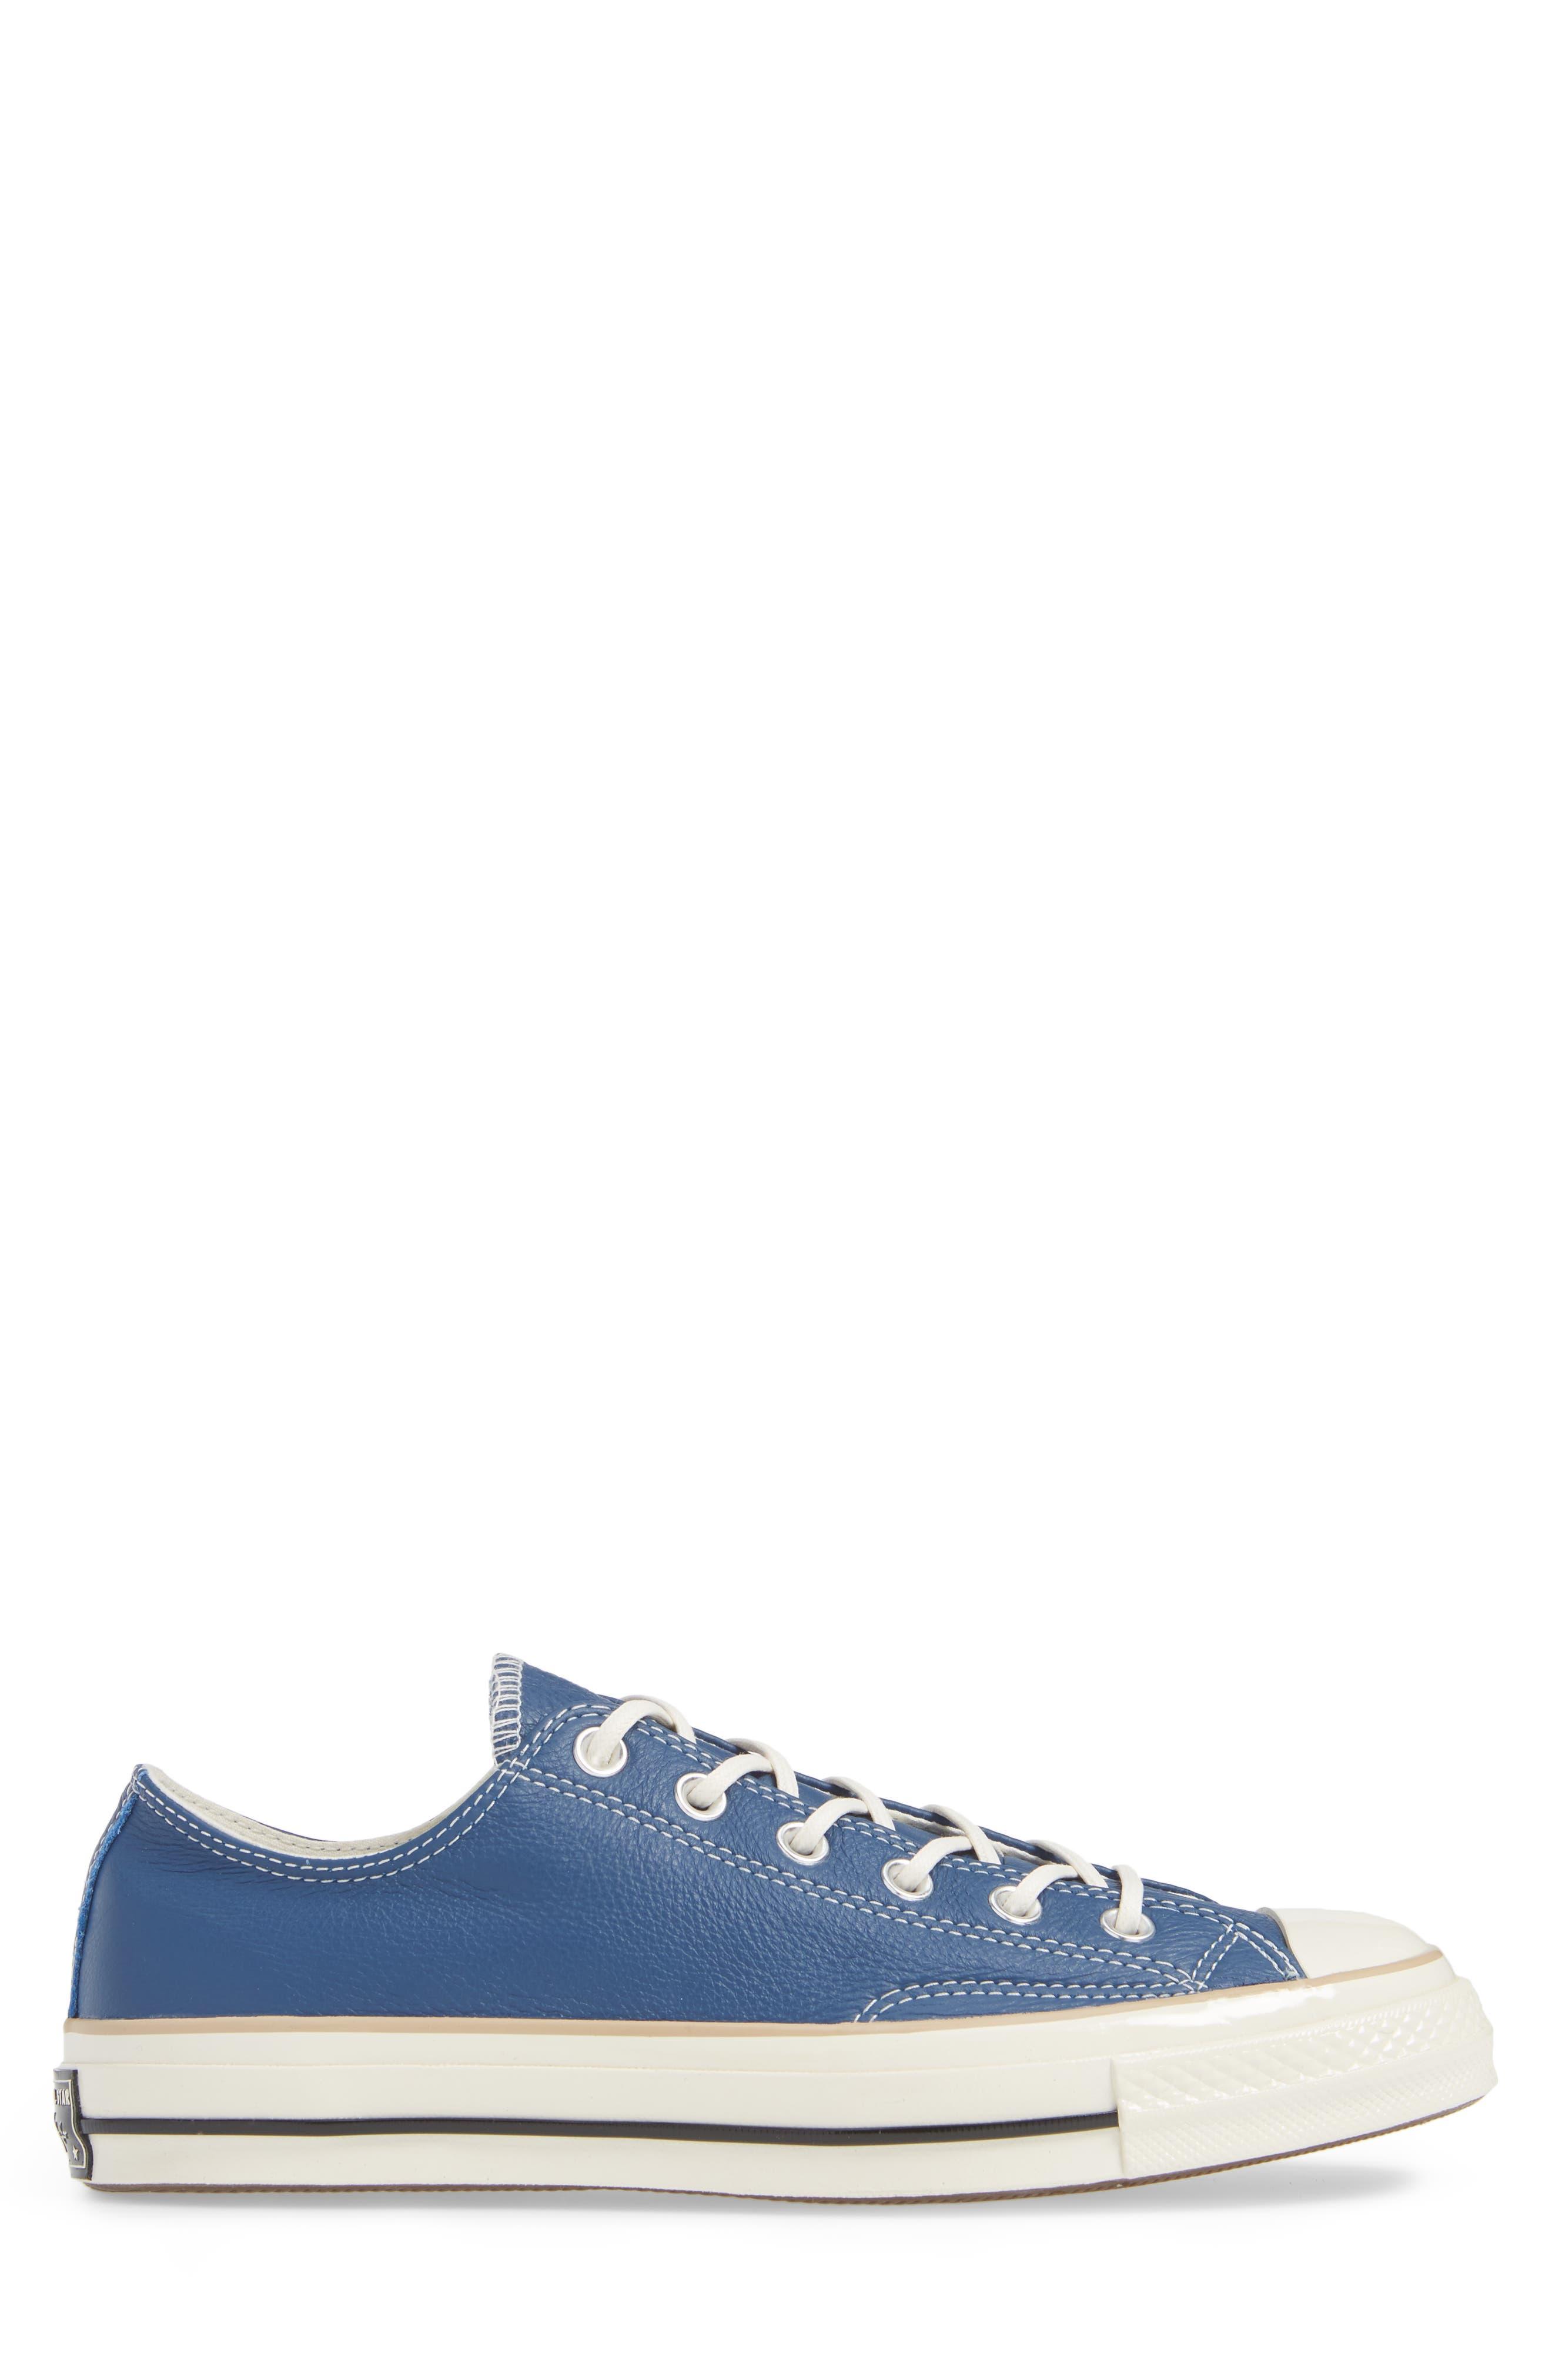 Chuck 70 Boot Leather Low Top Sneaker,                             Alternate thumbnail 3, color,                             DARK BURGUNDY/ CYAN/ EGRET